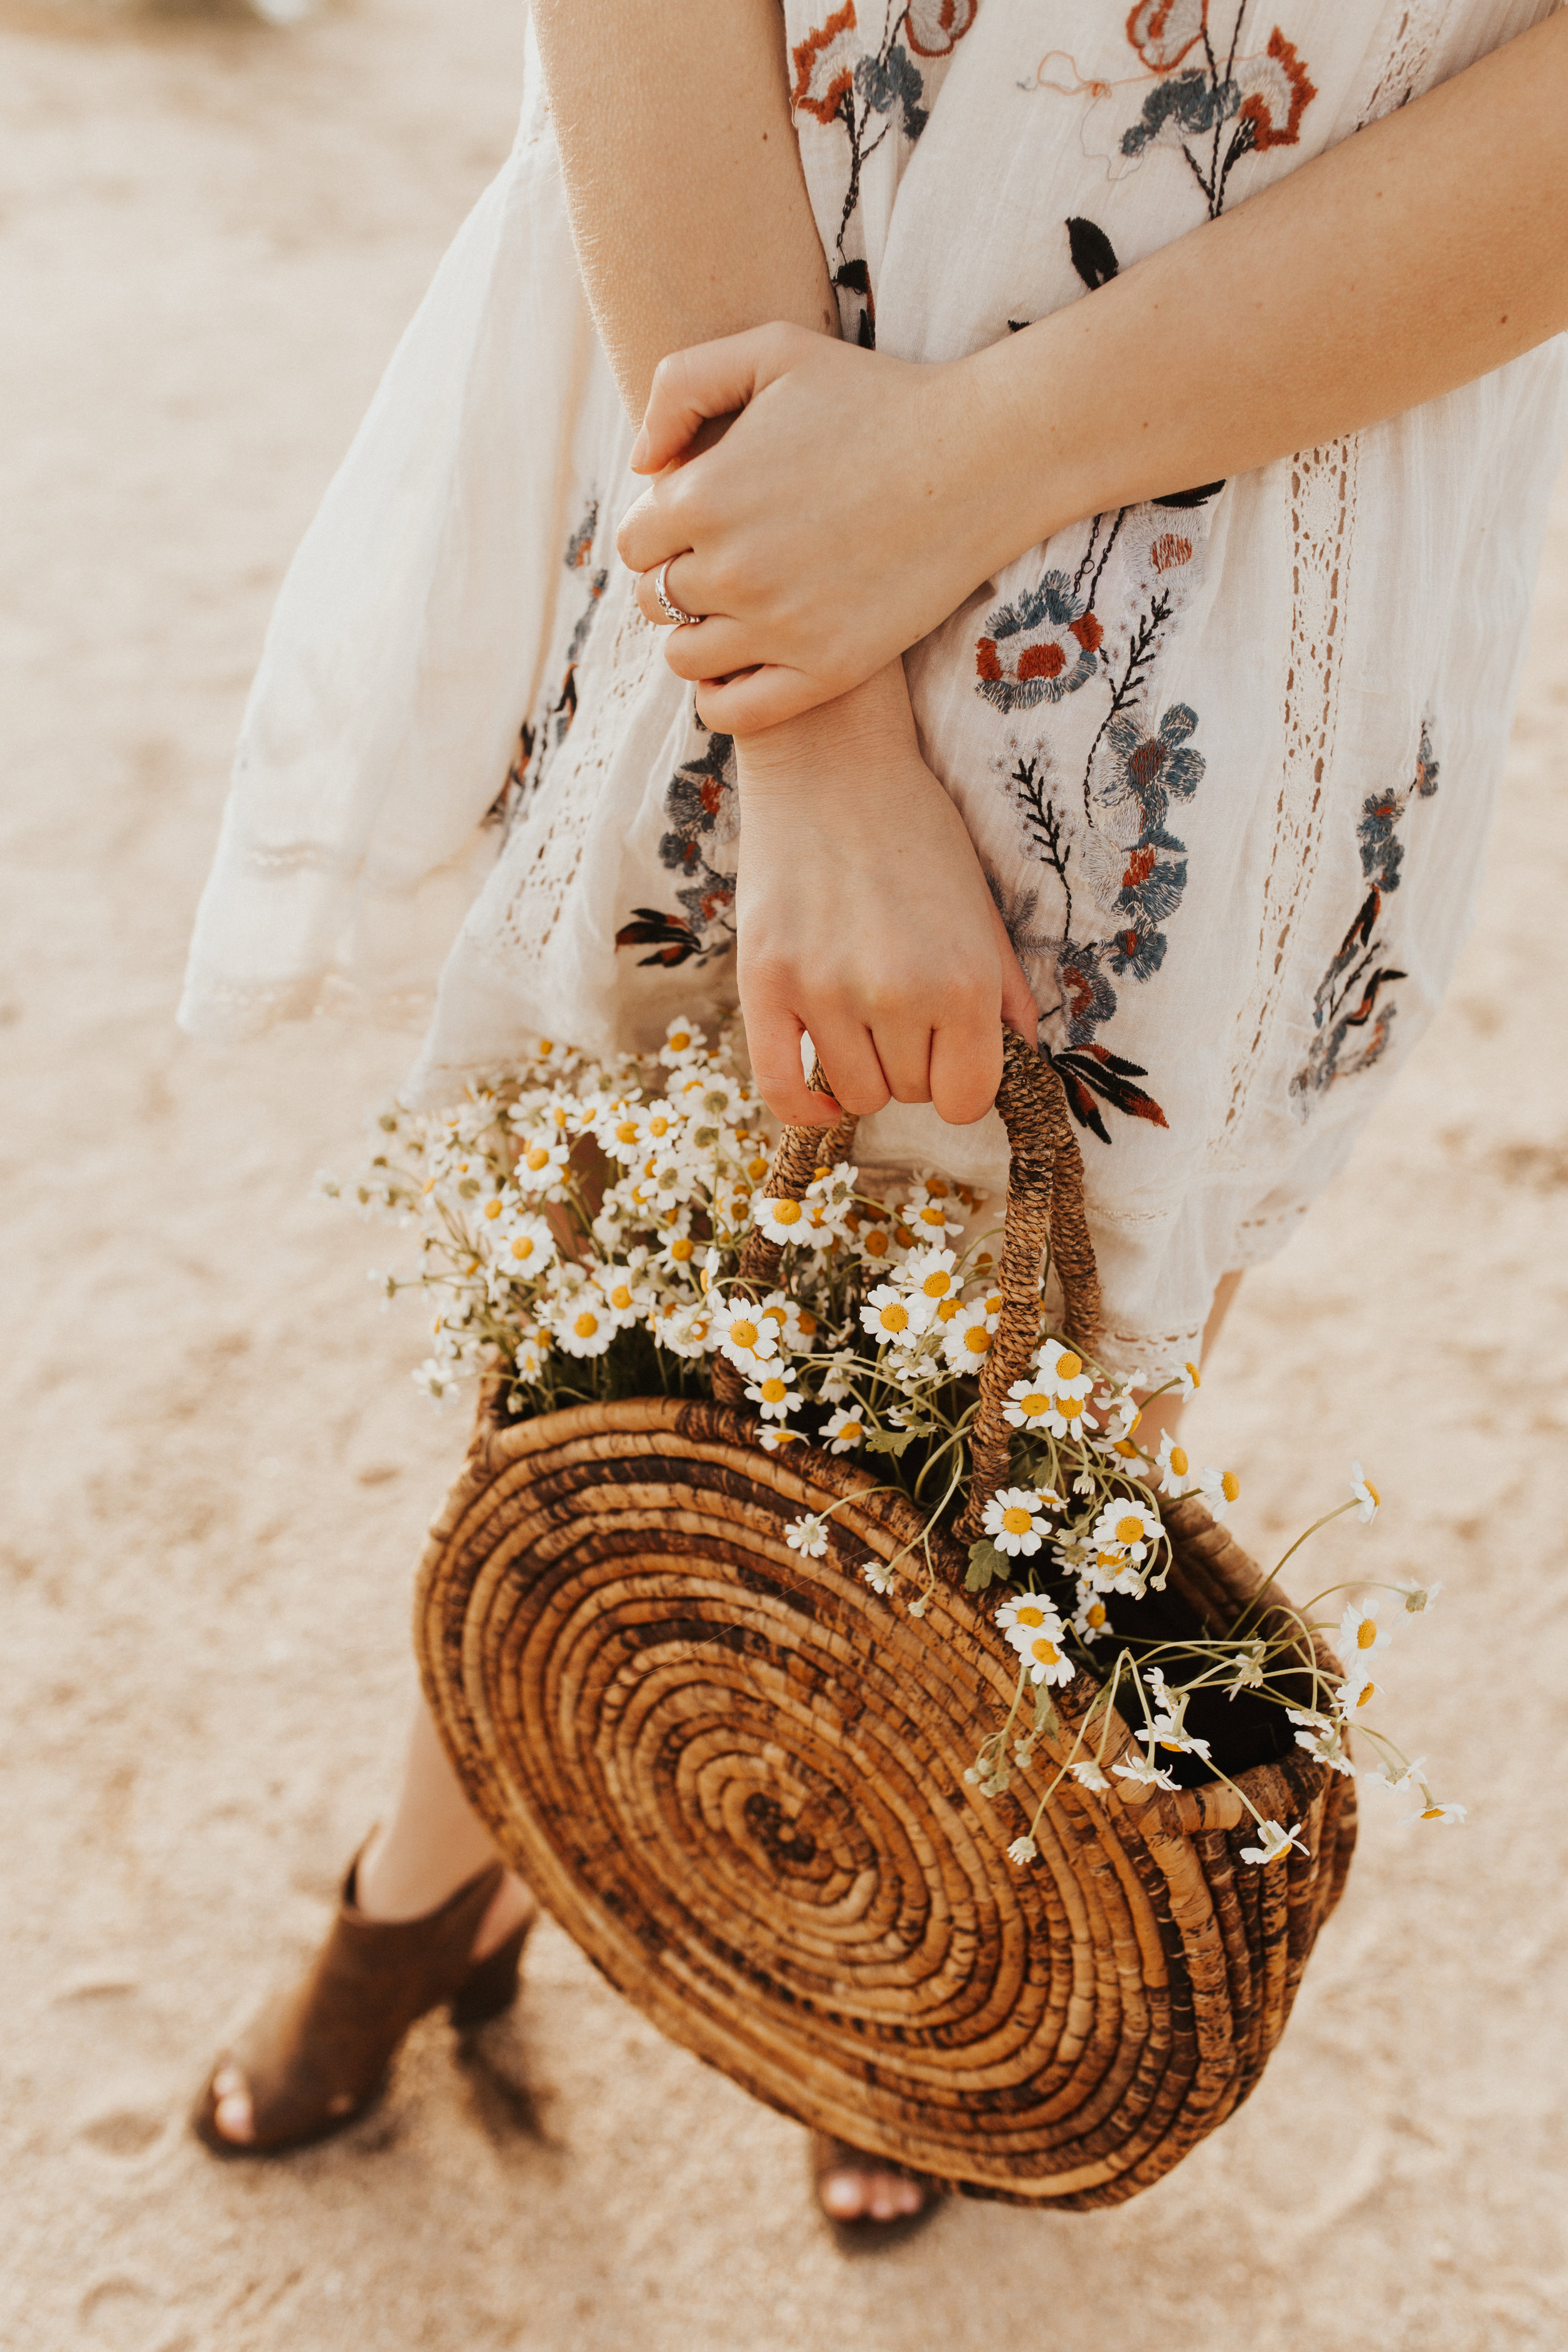 Bisou handbag from Songa Designs.